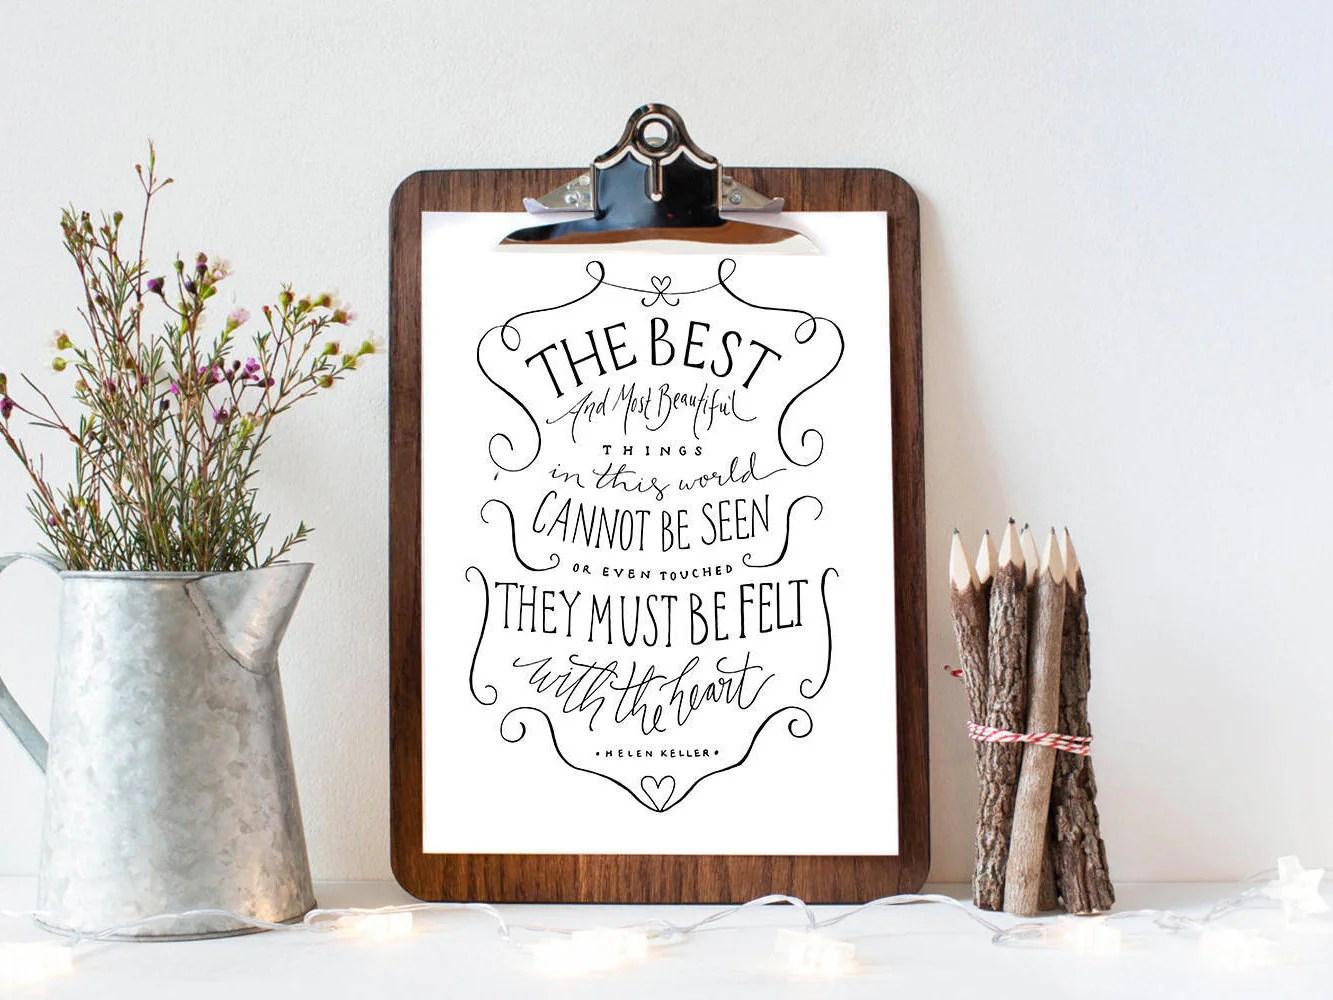 Helen Keller Quote Art Print Felt With The Heart